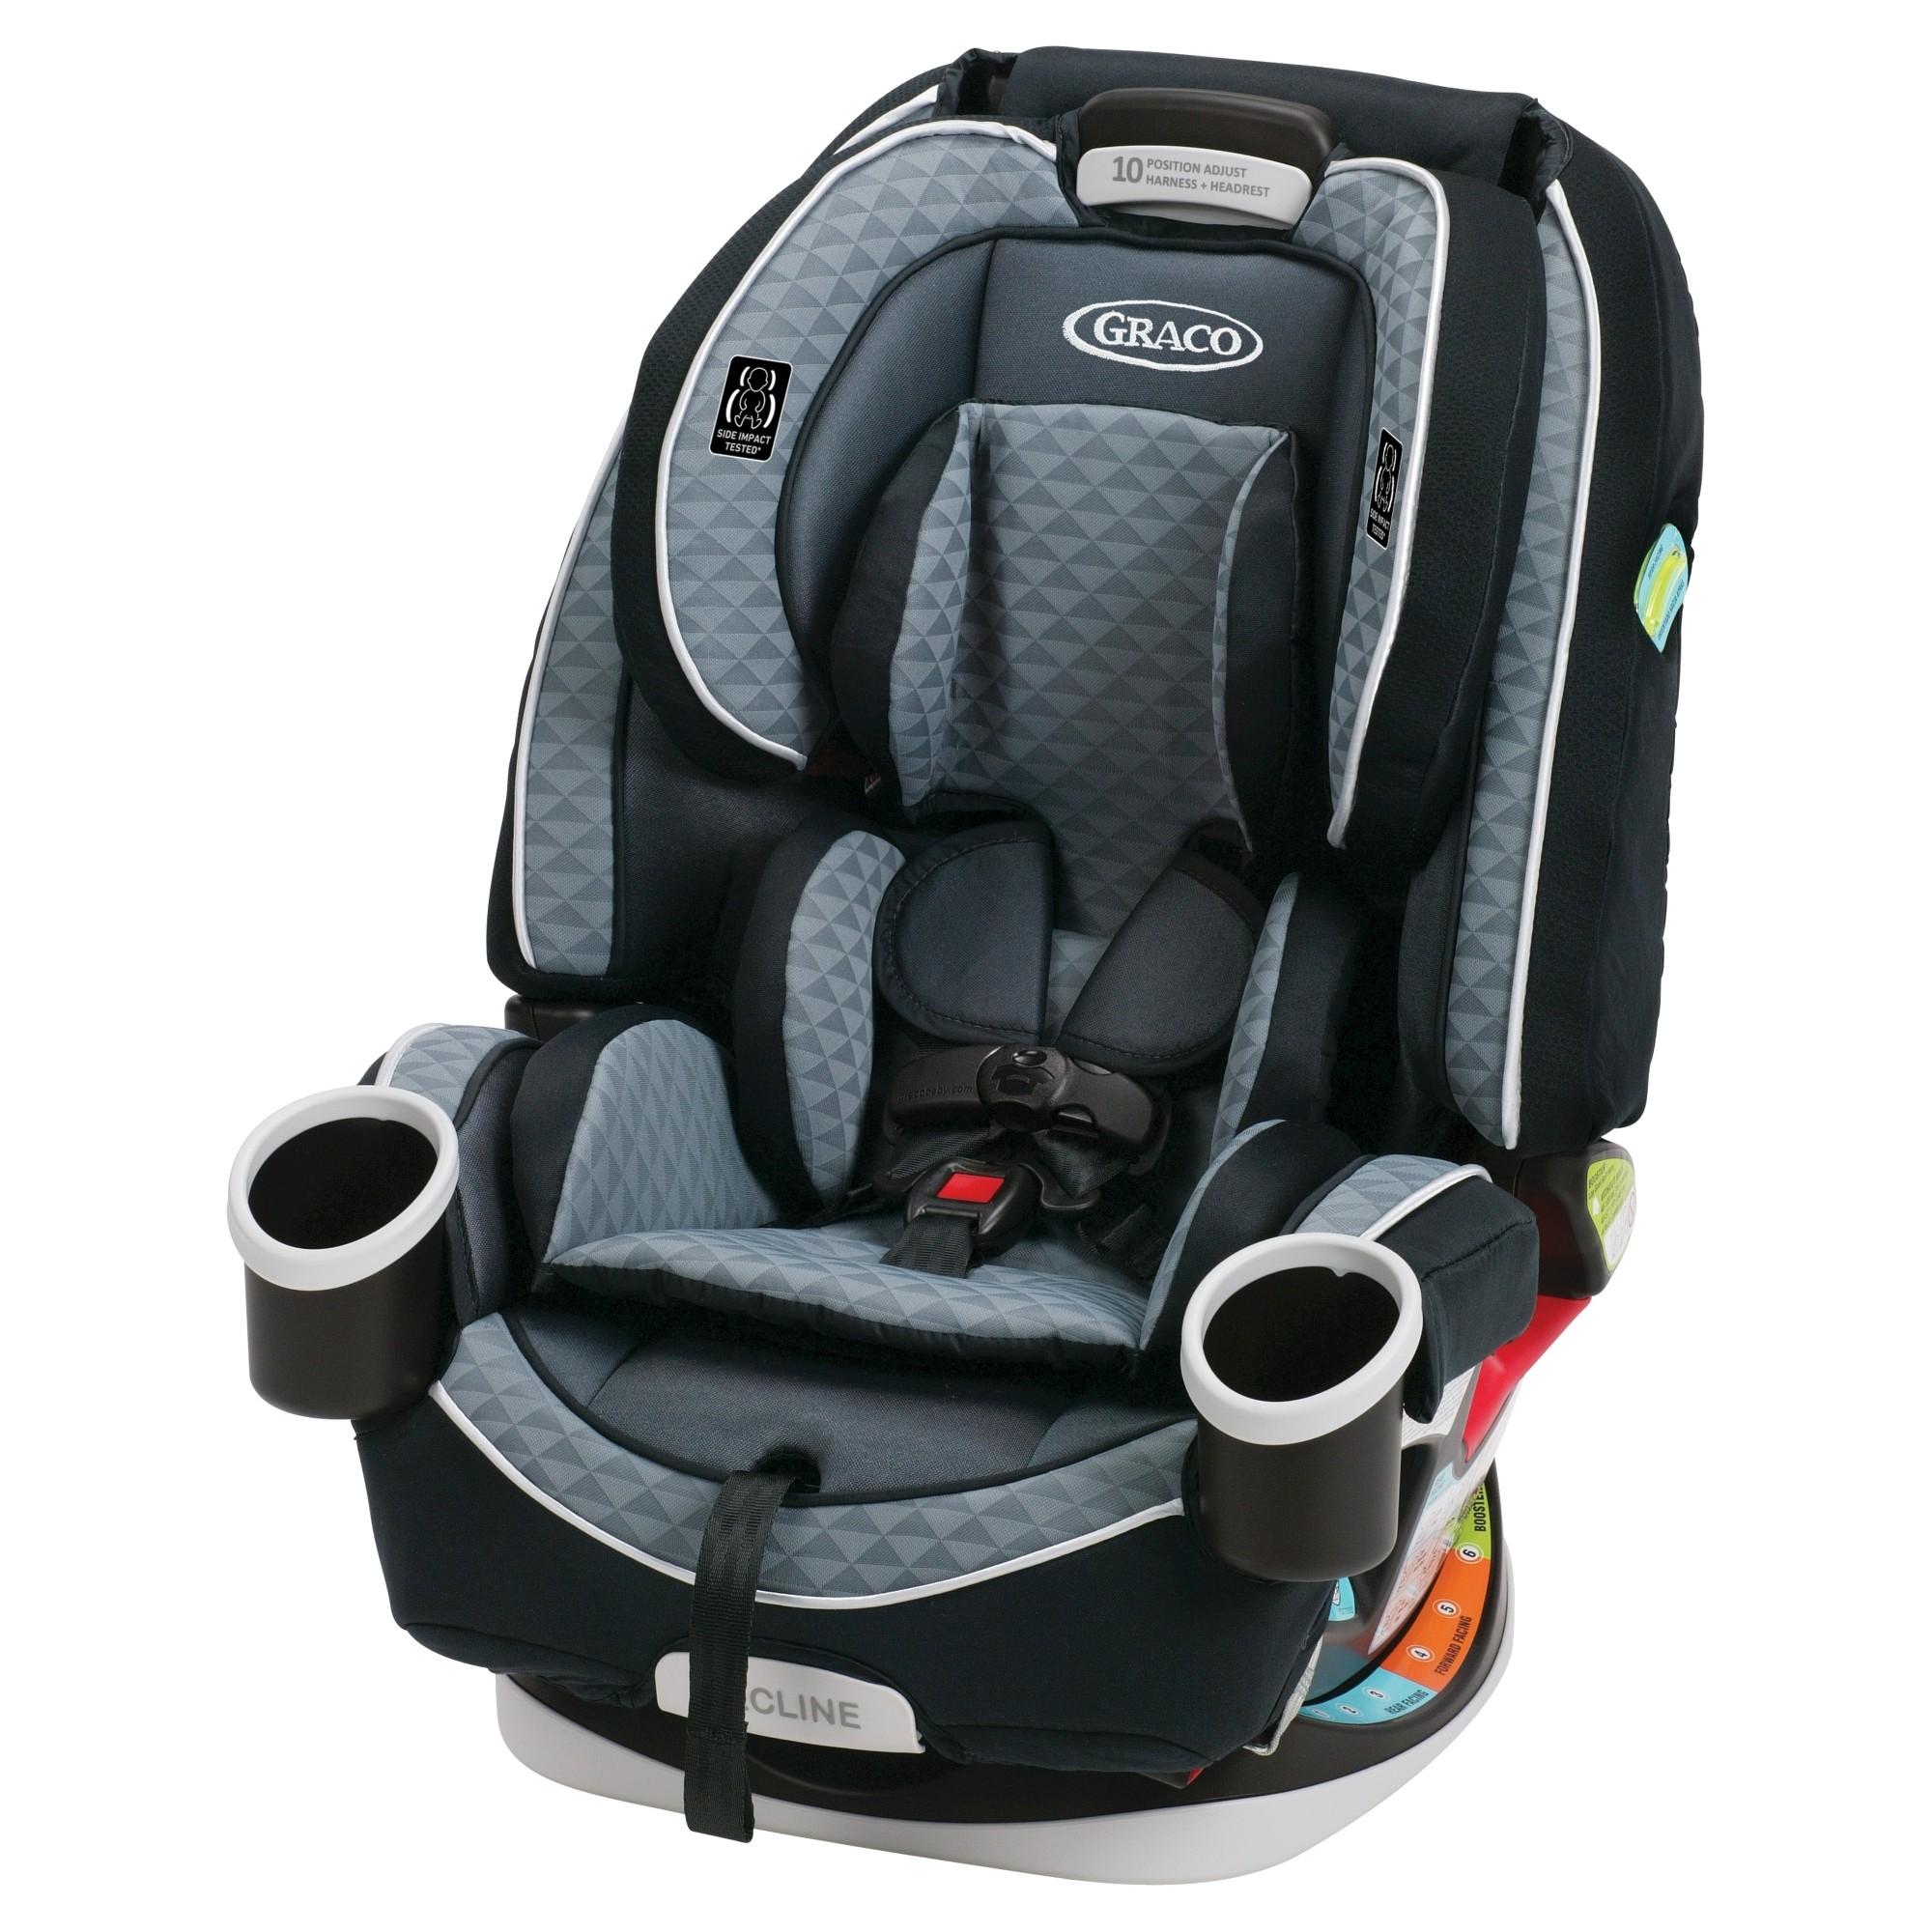 Graco 4Ever AllInOne Convertible Car Seat, Nova Best